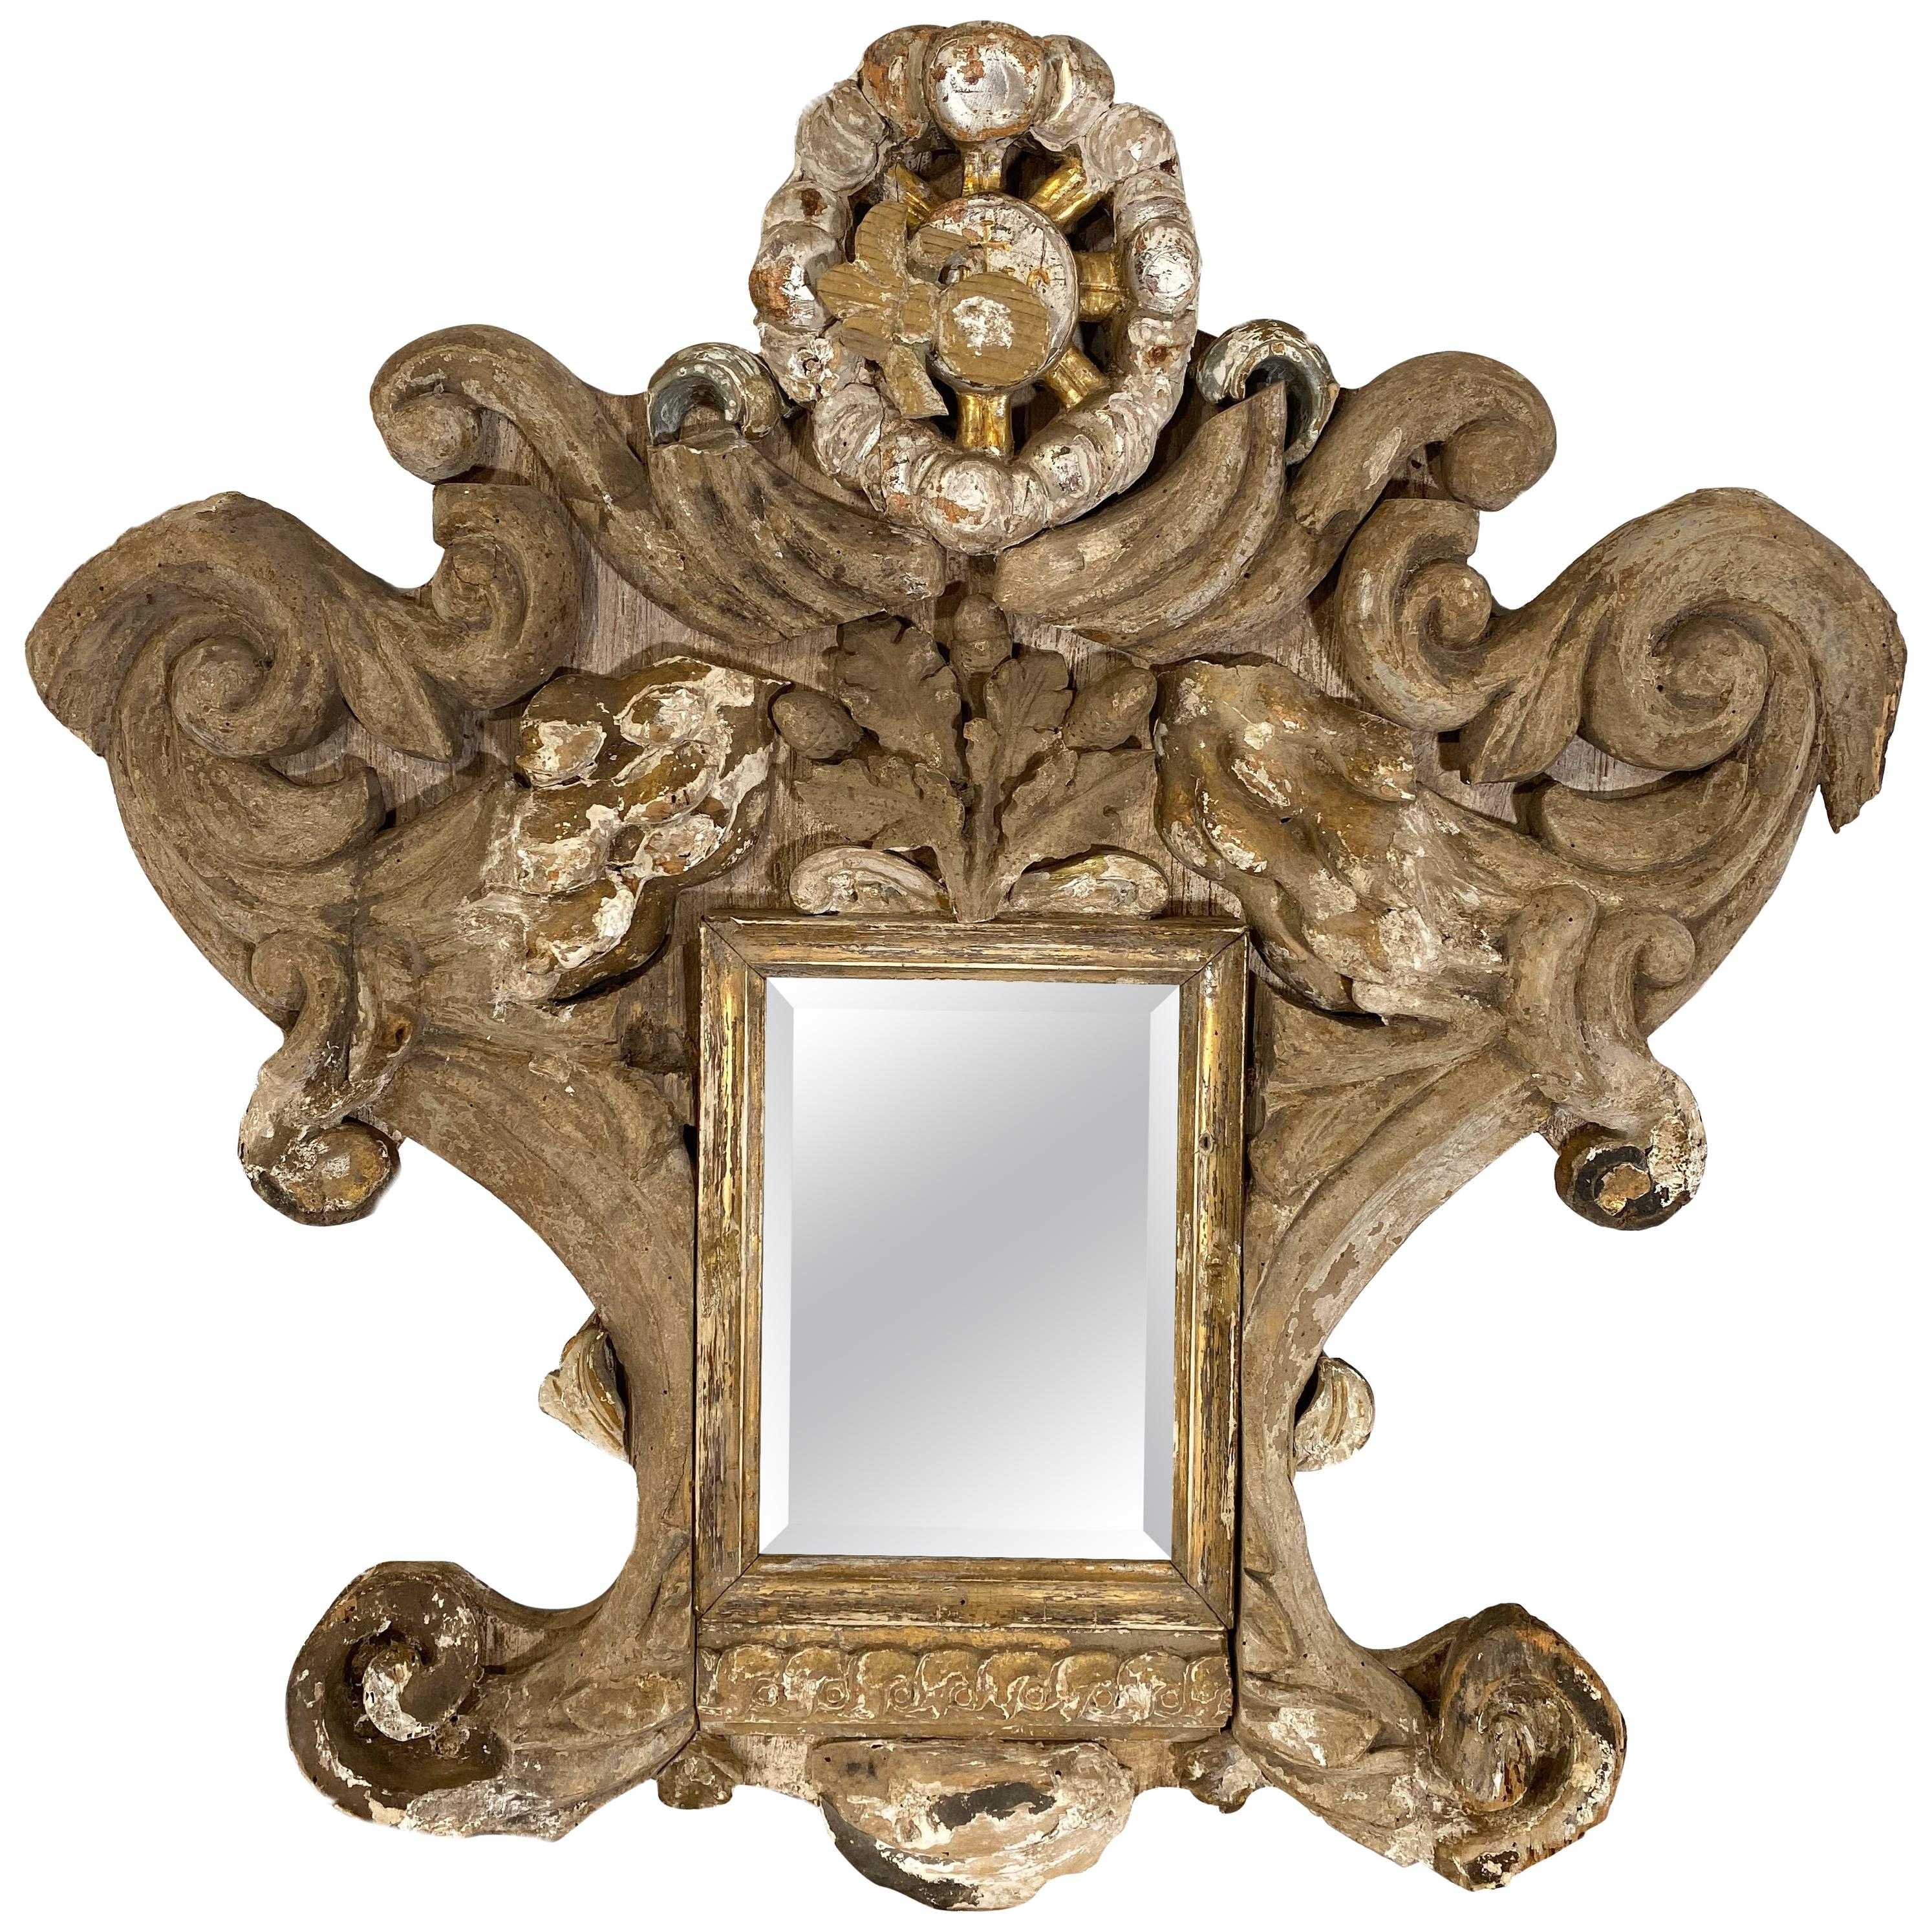 Small Mirror Made from 18th Century Italian Fragments